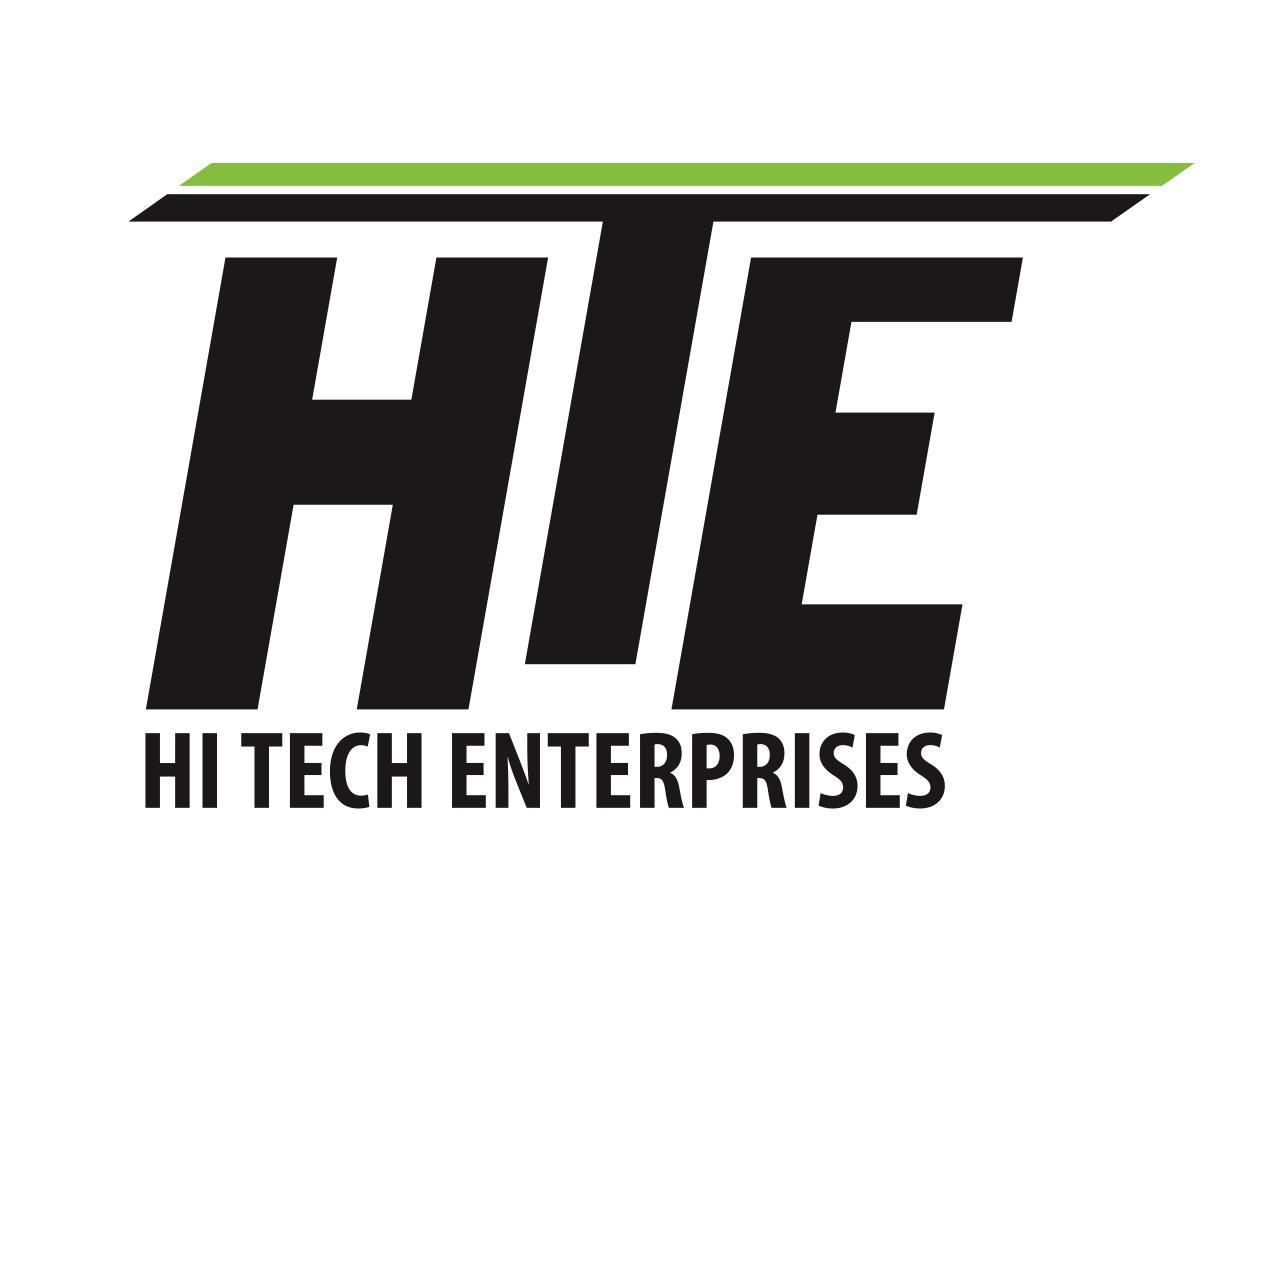 Hi Tech Enterprises